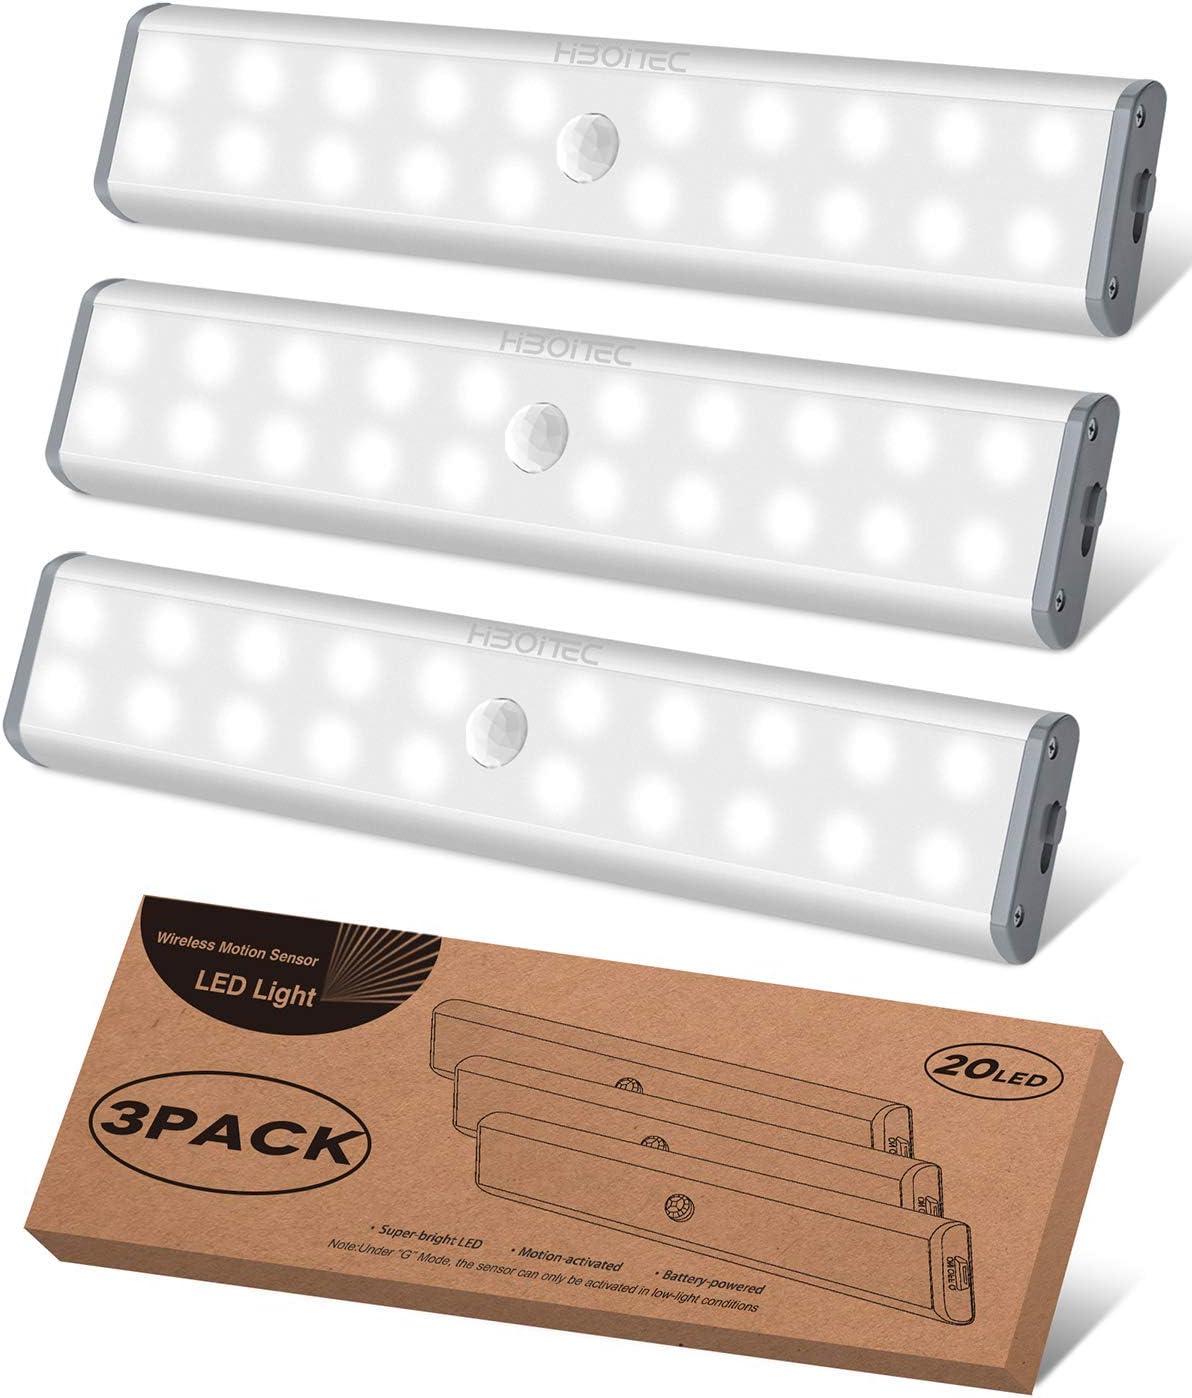 Under Cabinet Lighting Closet Light 20 LEDs 3 Packs, Wireless Rechargeable Cabinet Lights, Magnetic Under Counter Lighting, LED Motion Sensor Night Light for Closet Cabinet Wardrobe Stairs (White)